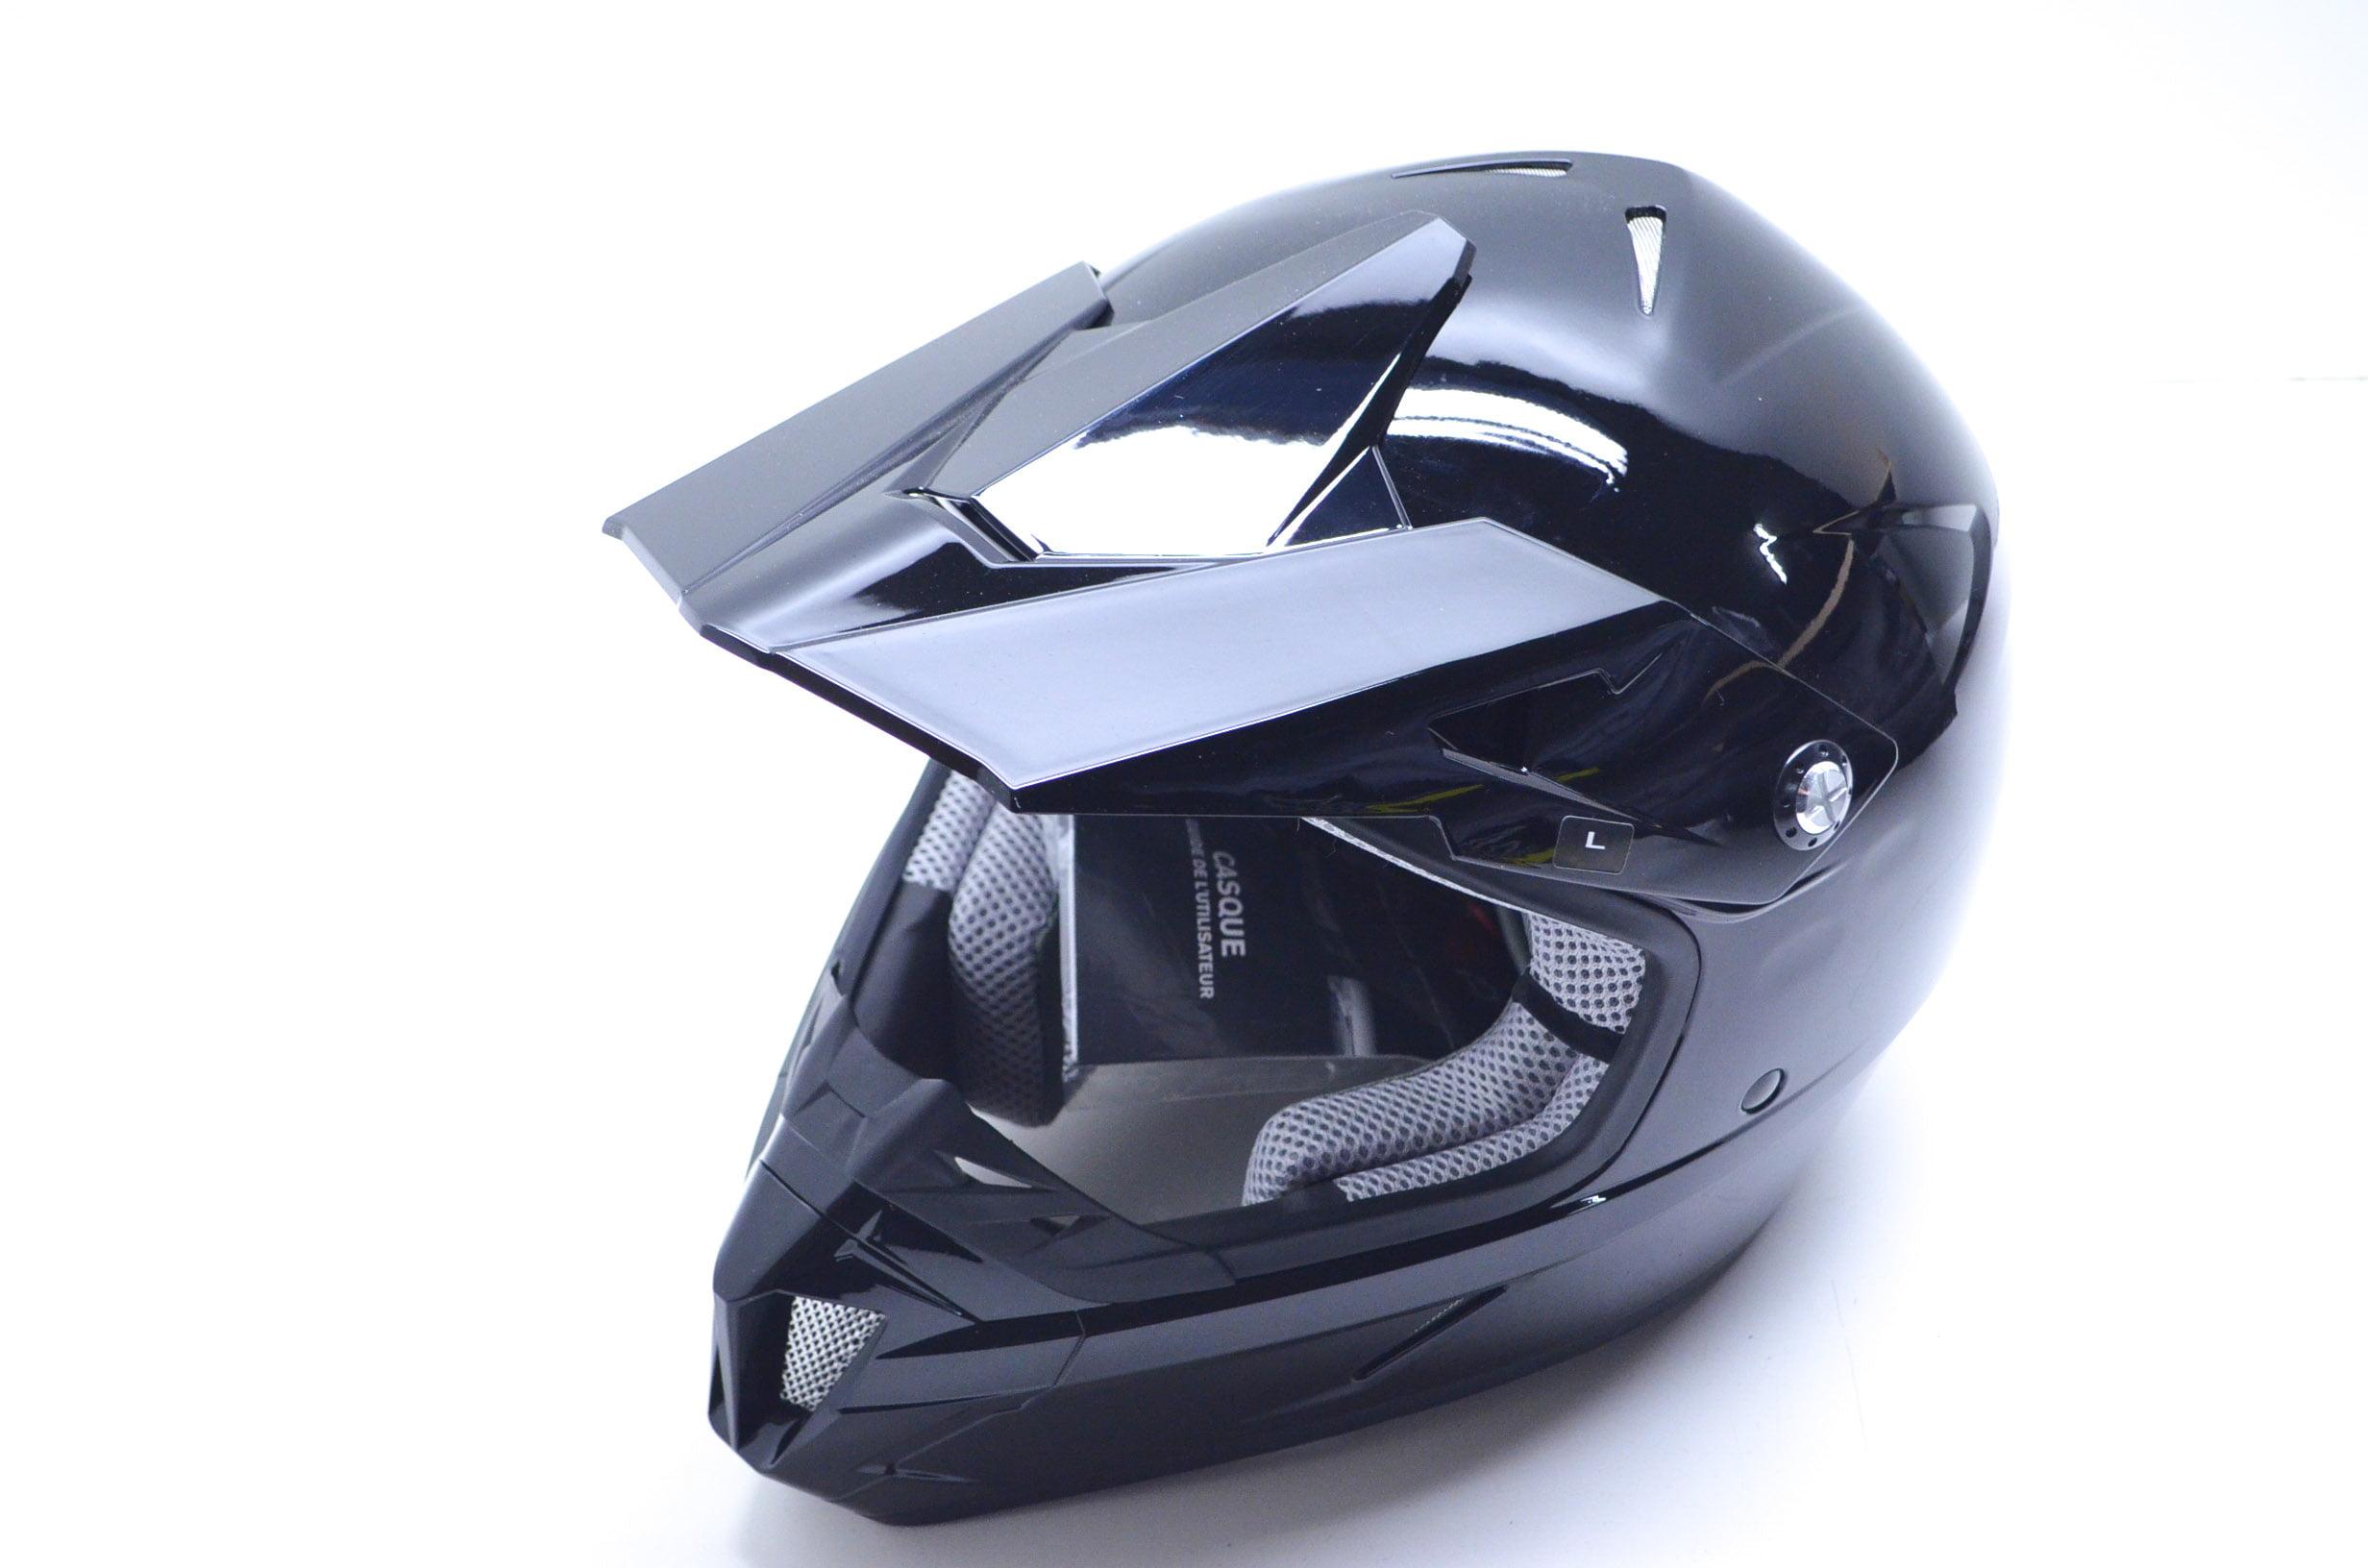 Can-Am, Sea-Doo, Ski-Doo 4482500990 Ski-Doo Black Large XC-4 Cross Helmet QTY 1 by Can-Am, Sea-Doo, Ski-Doo